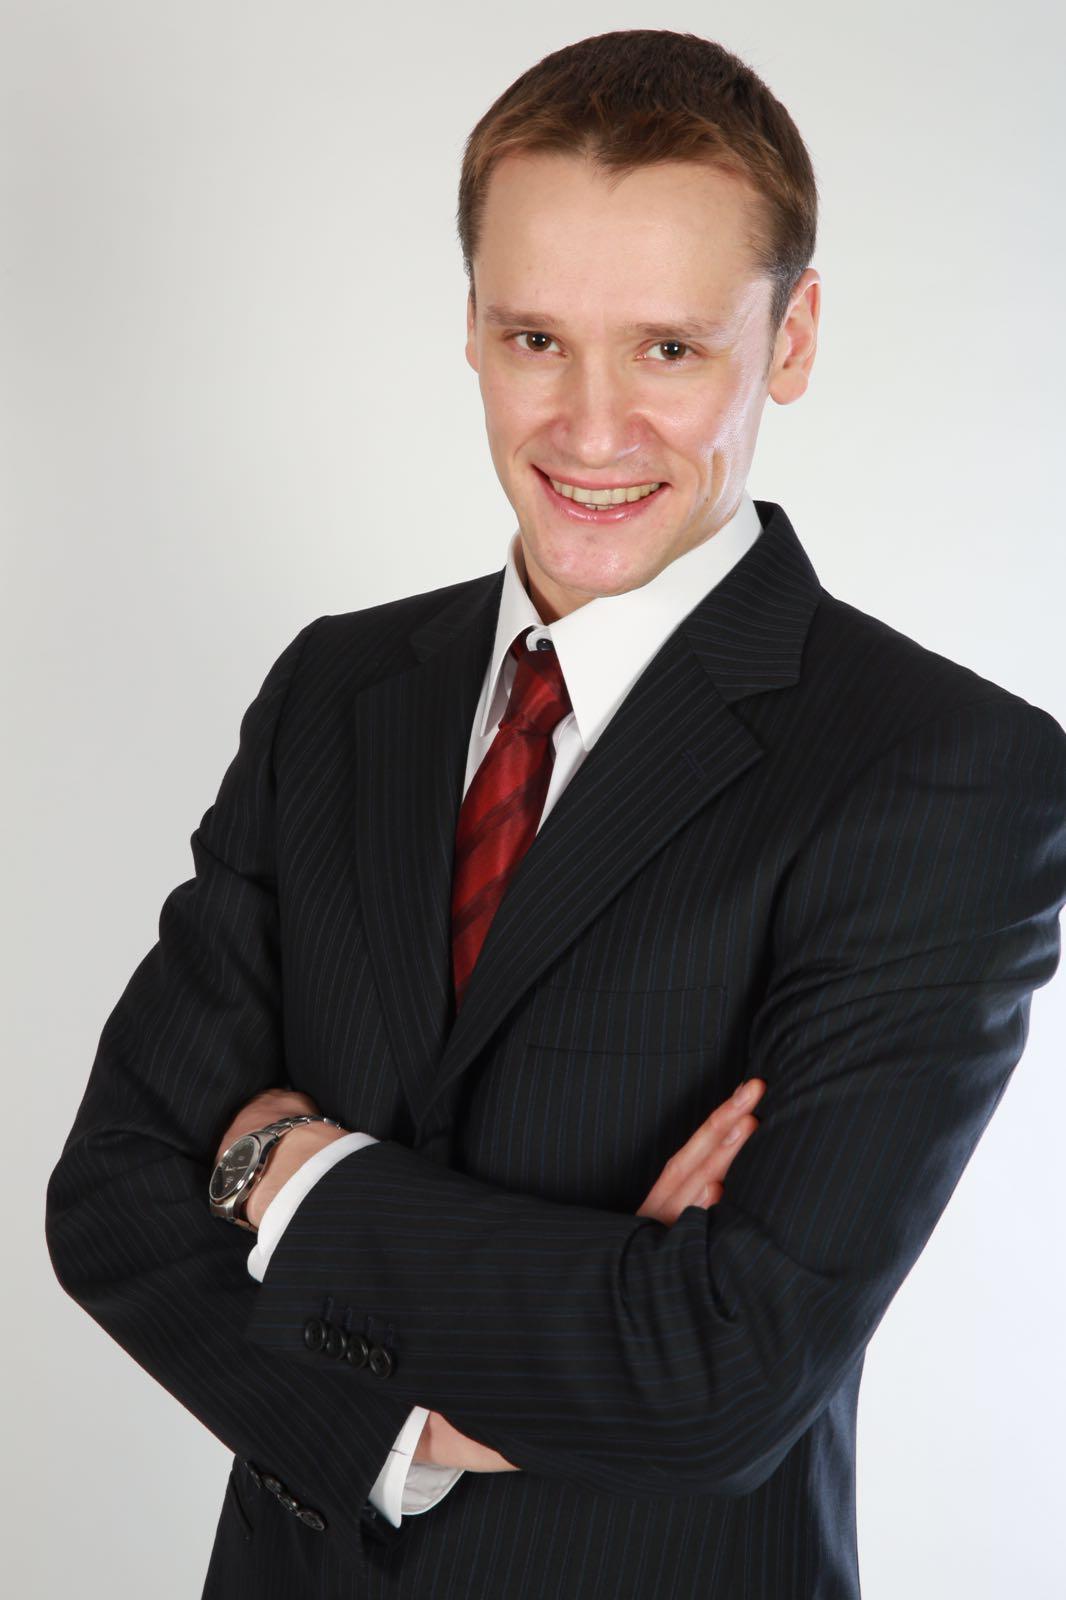 Dmitry Semionov, Ballettdirektor